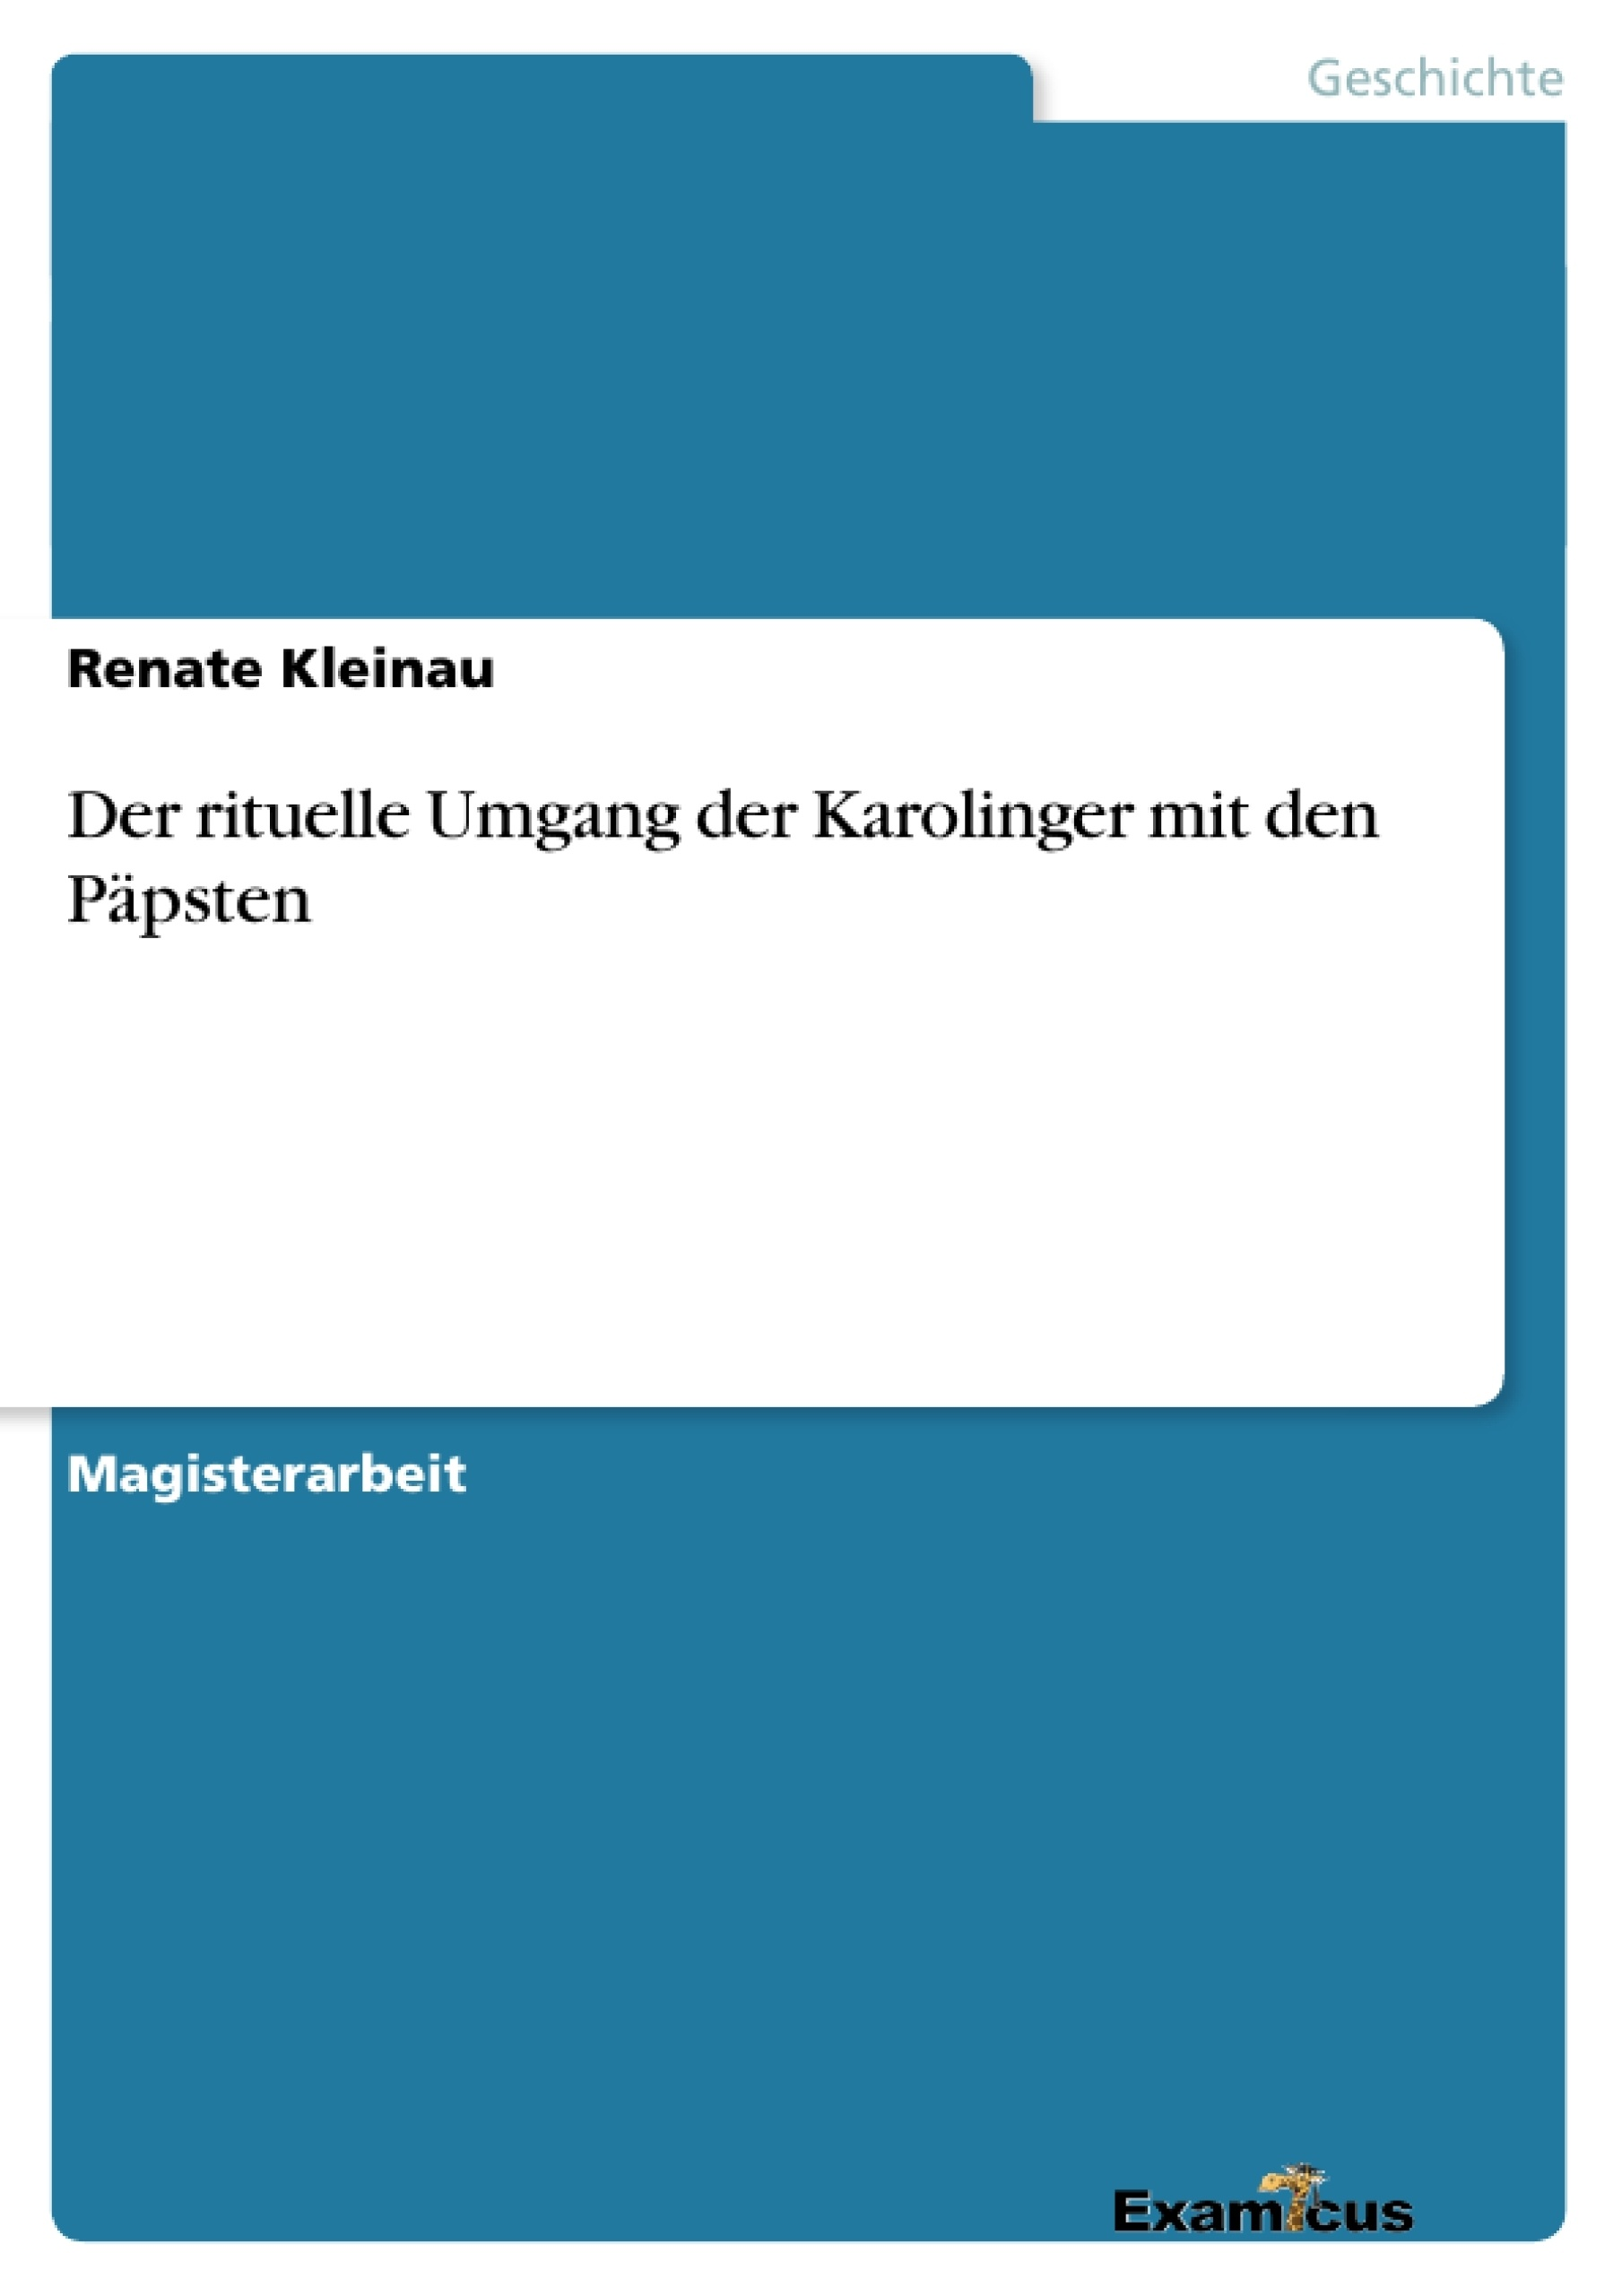 Titel: Der rituelle Umgang der Karolinger mit den Päpsten